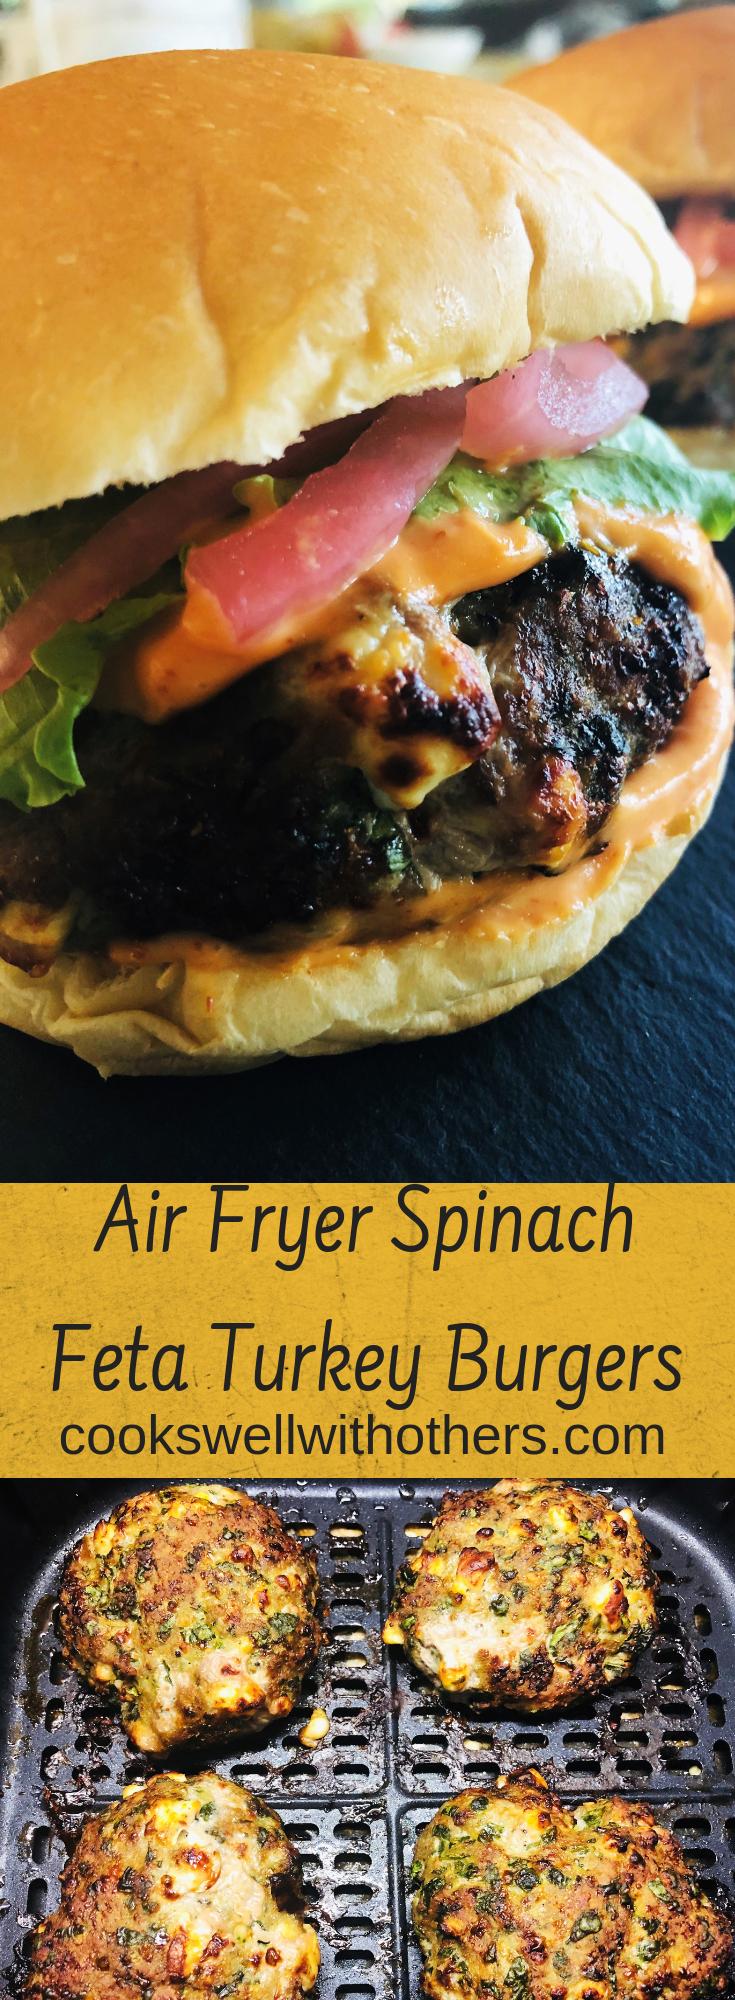 Air Fryer Spinach Feta Turkey Burgers Air fryer recipes